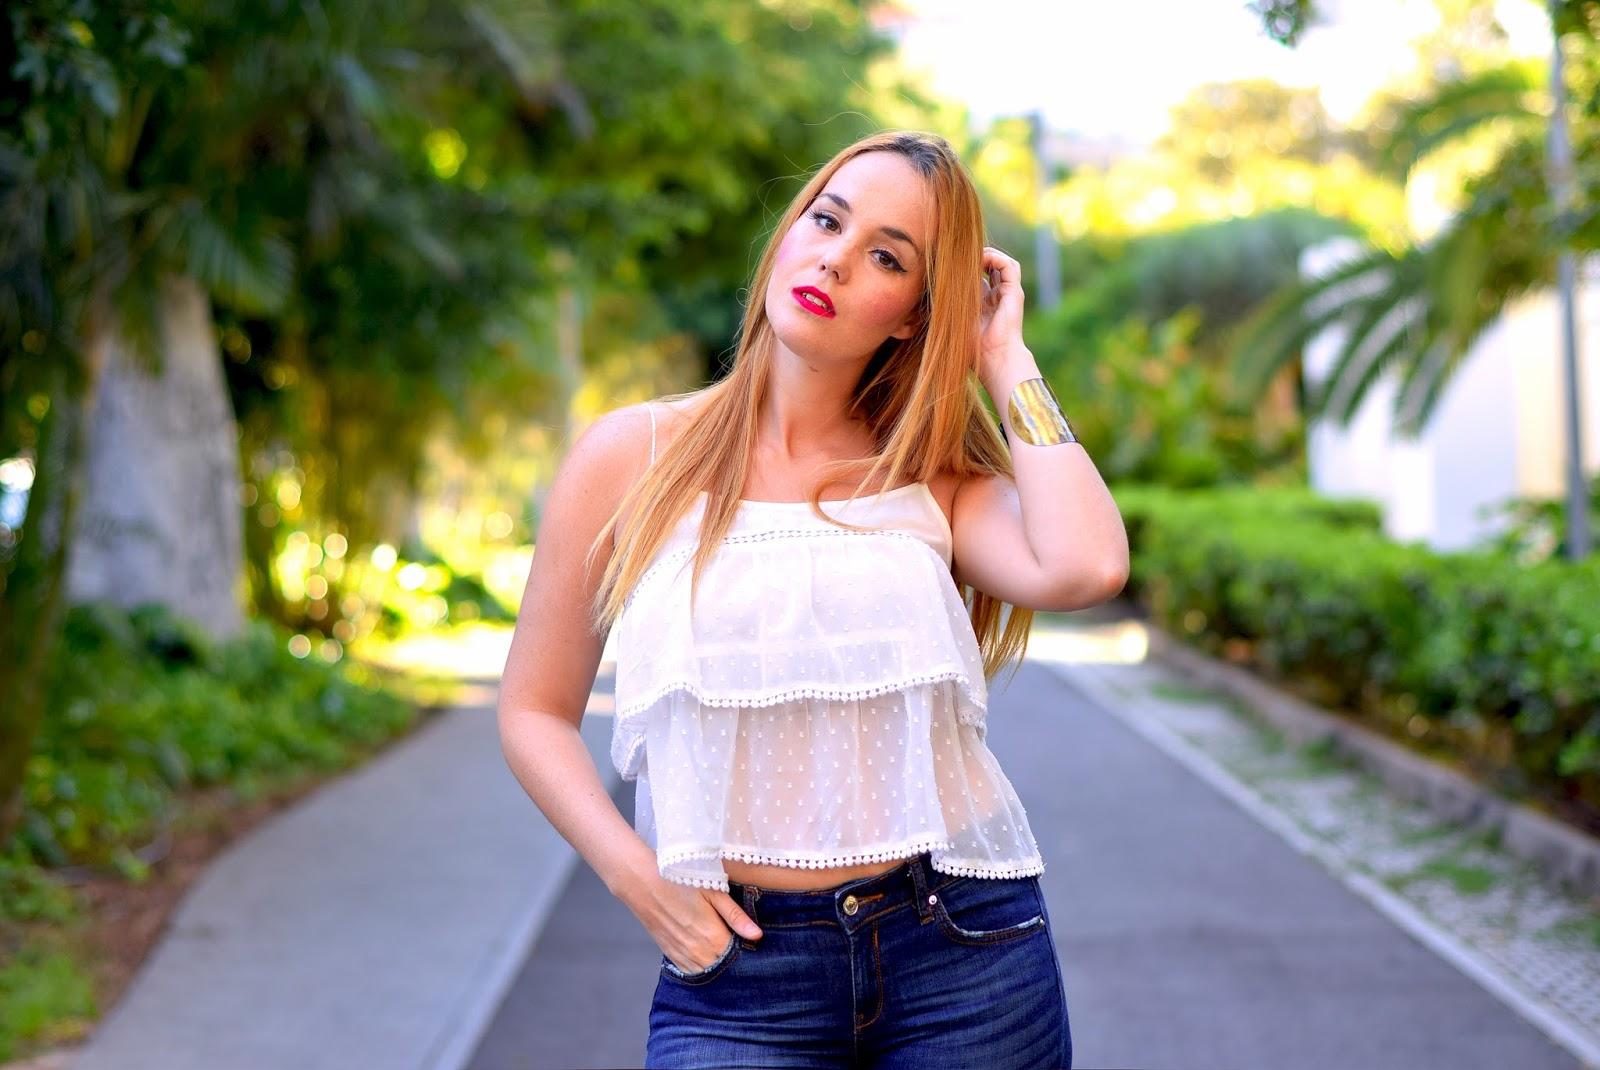 nery hdez, jeans, blonde fashionblogger, crop top, stradivarius top, amiclubwear